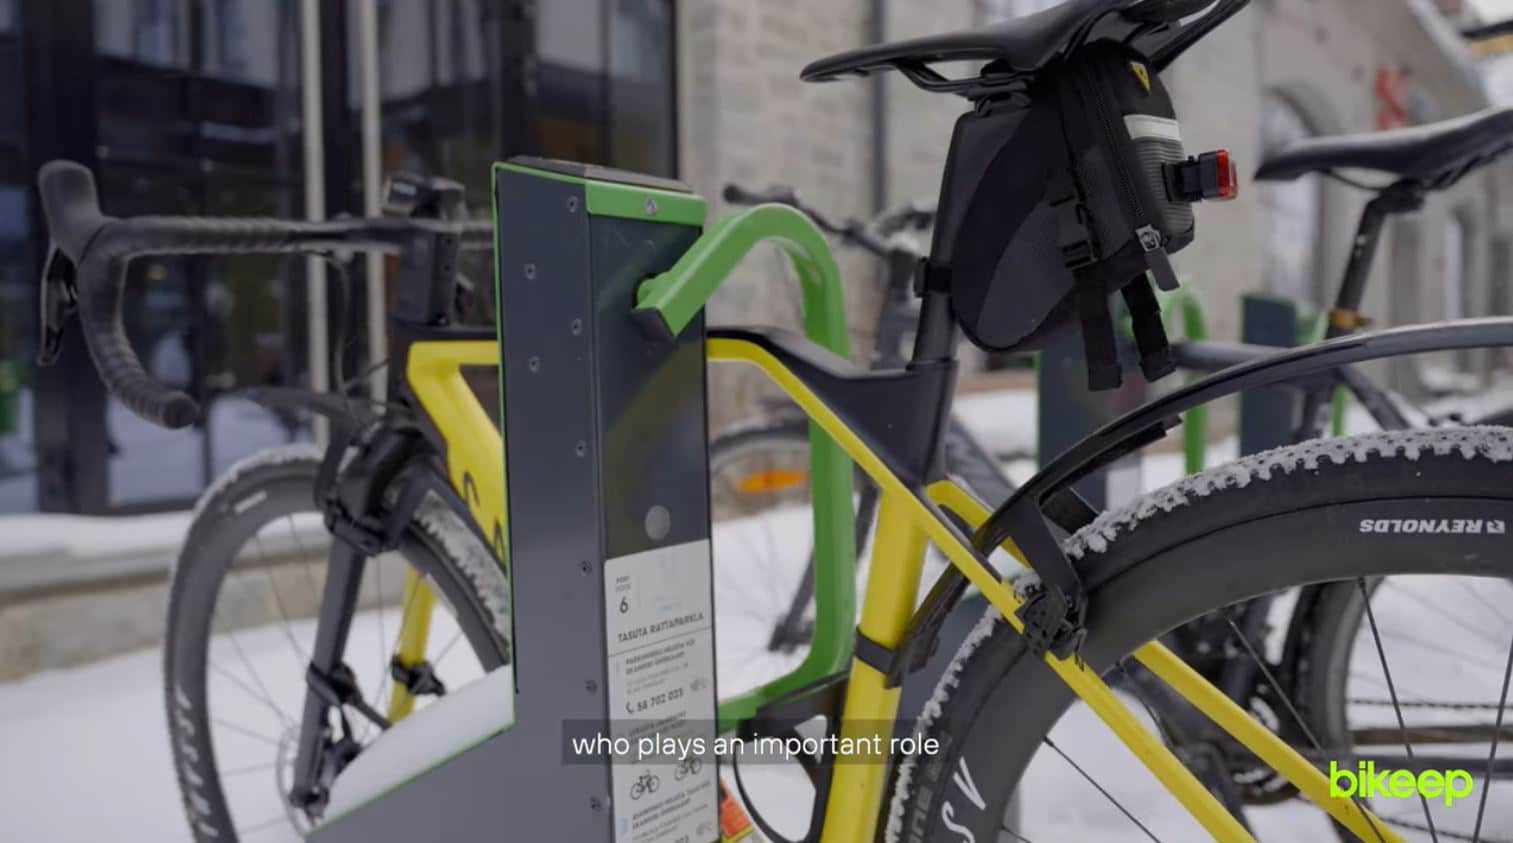 ylemiste city bikeep cooperation